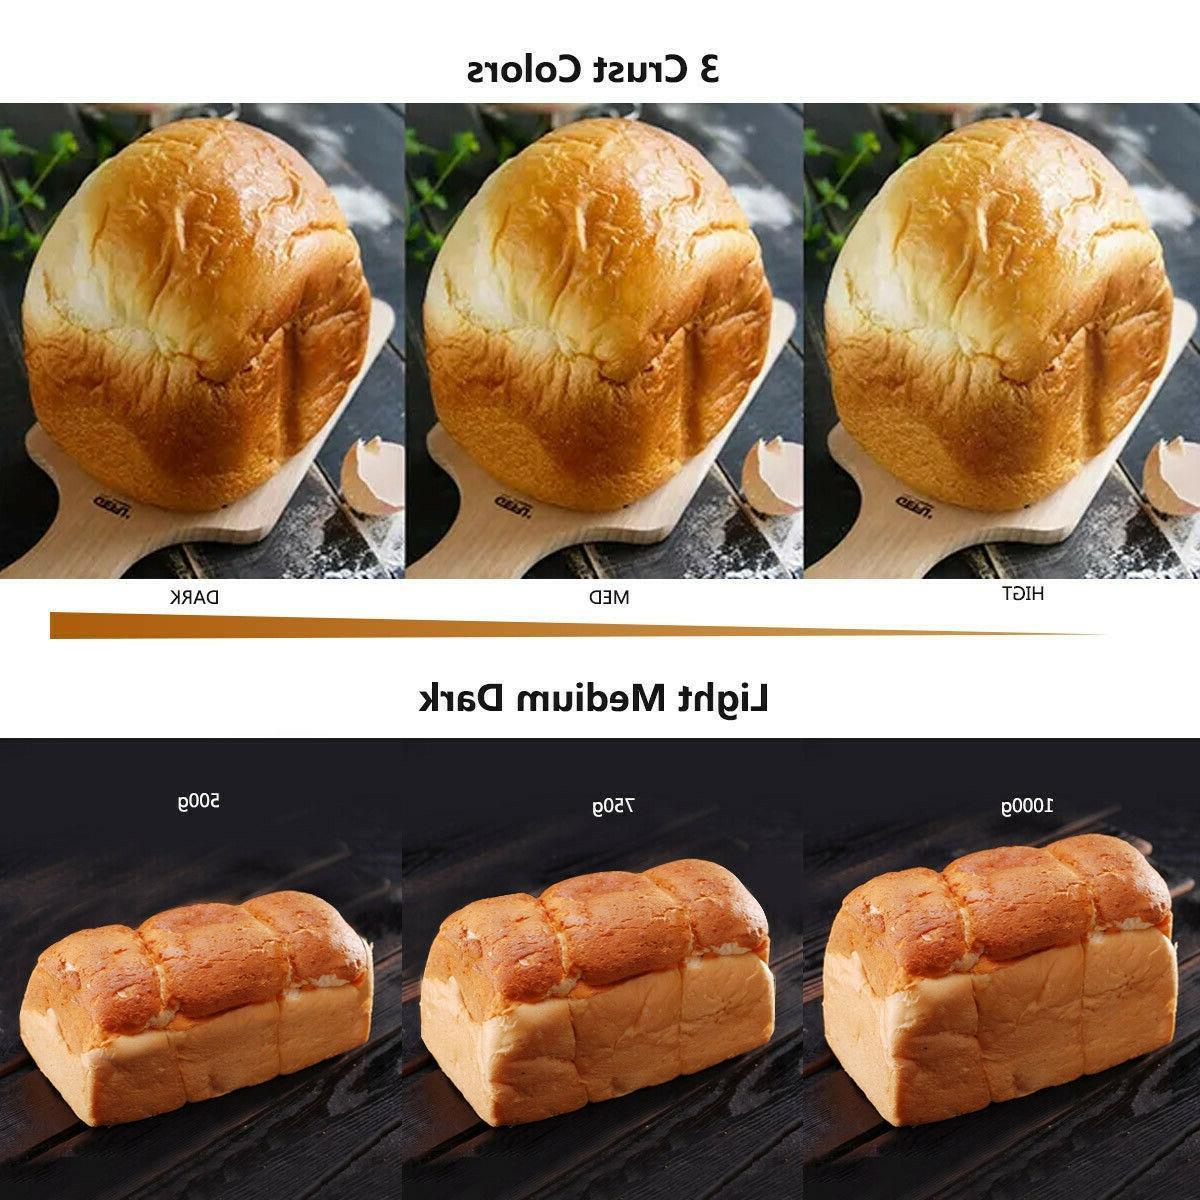 2 librasMaquina programadora de pan de inoxidable